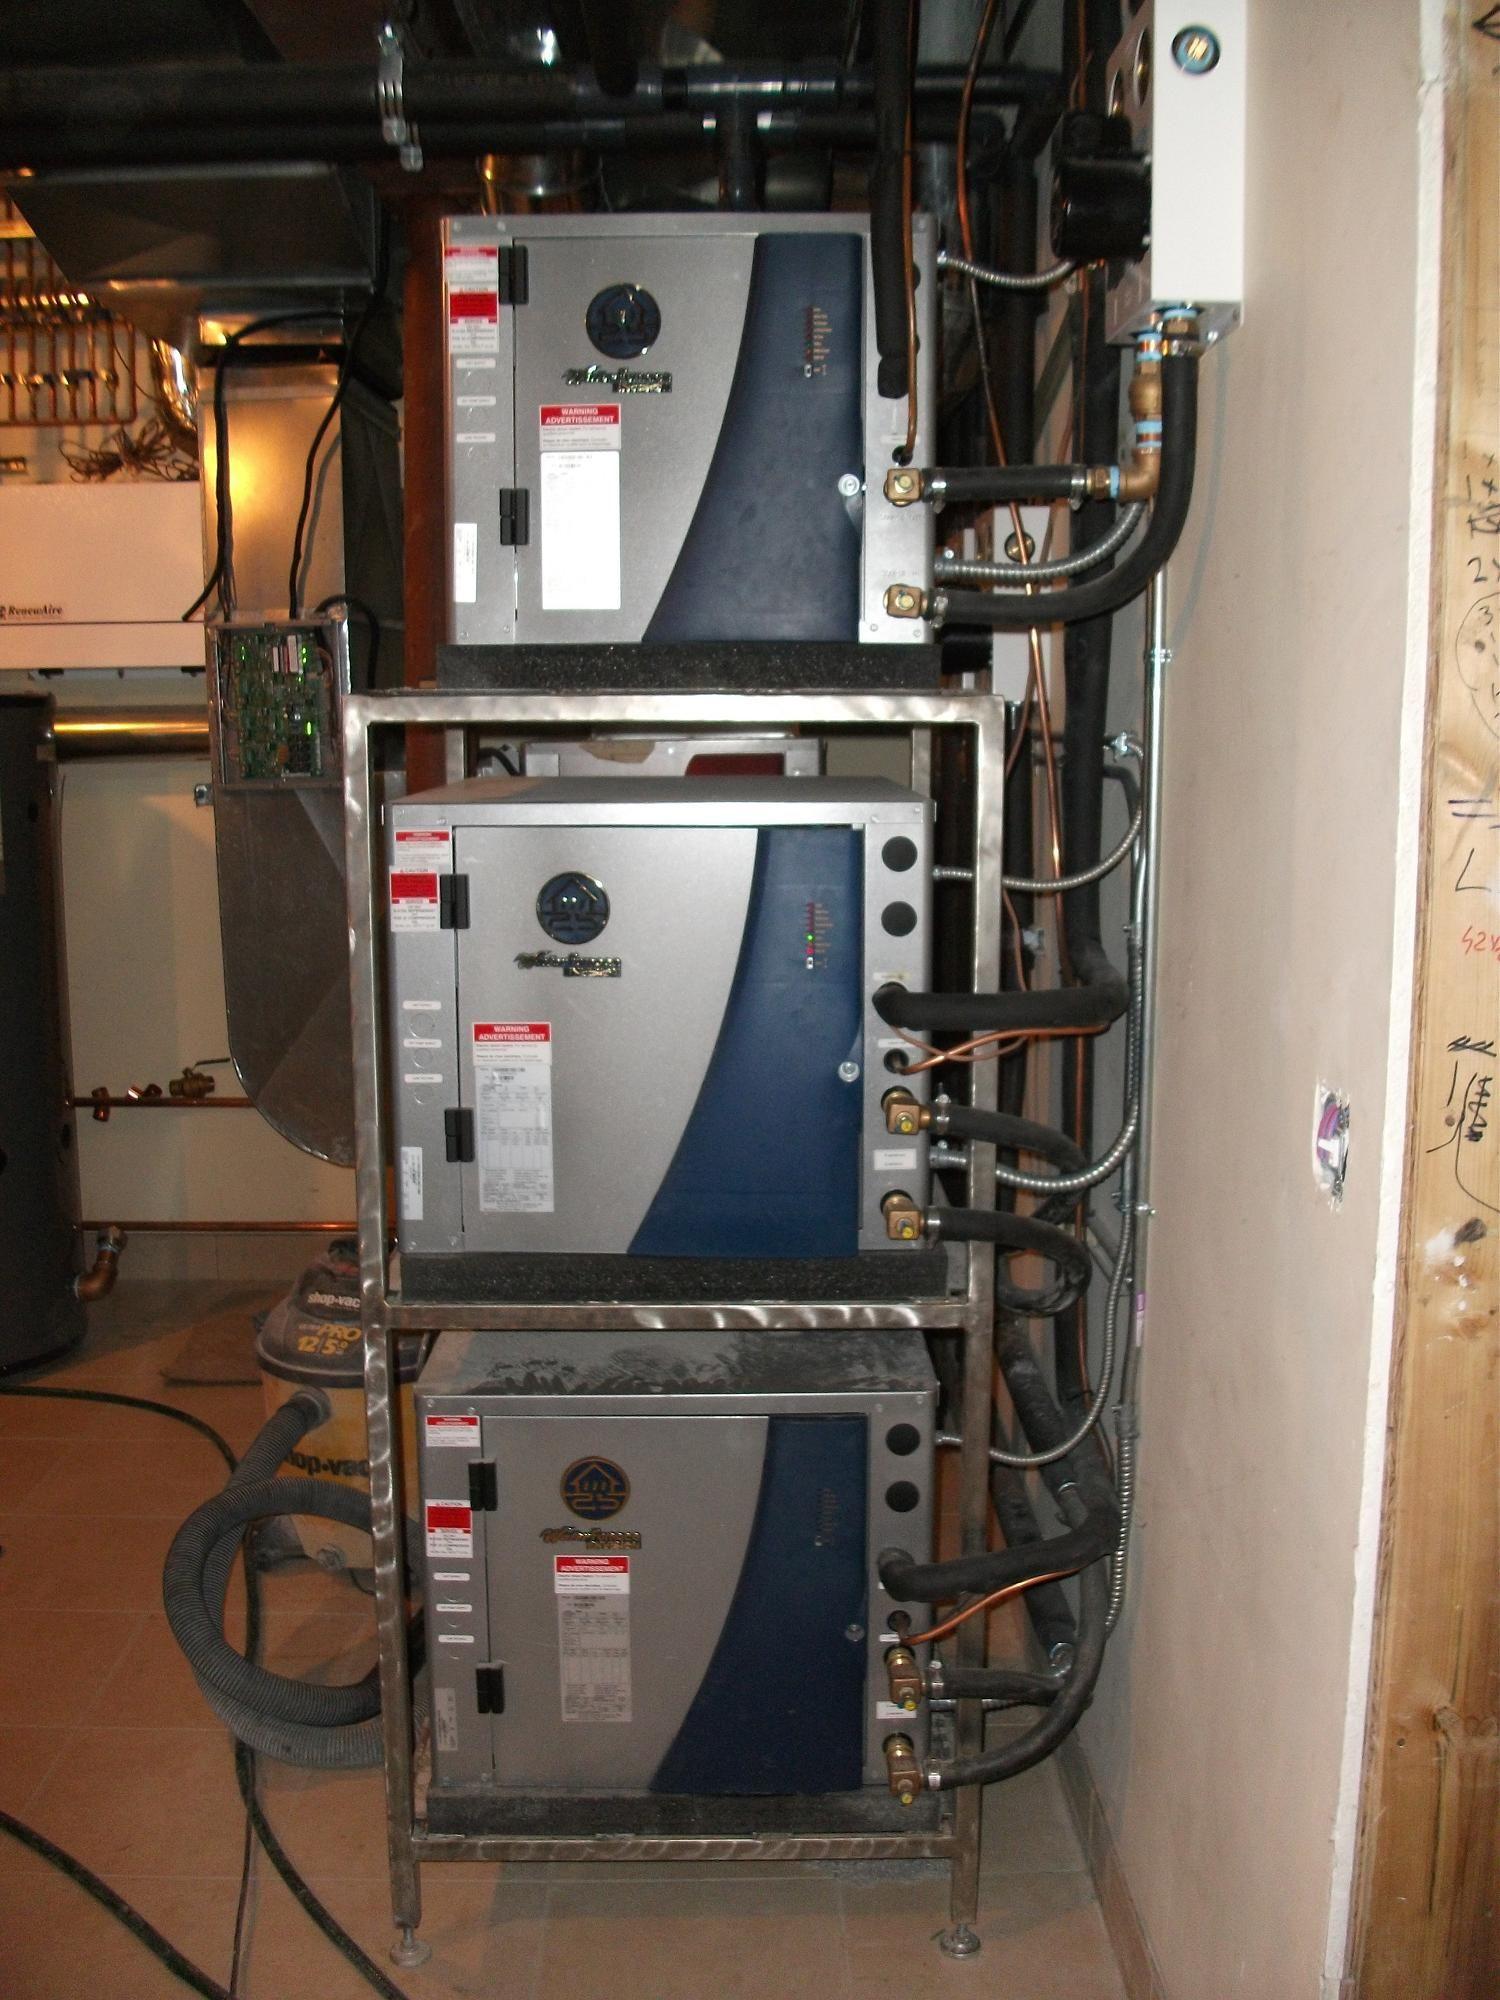 Waterfurnace Multiple Units Installed Air Ease Heating And Cooling Geothermal Energy Geothermal Geothermal Heating